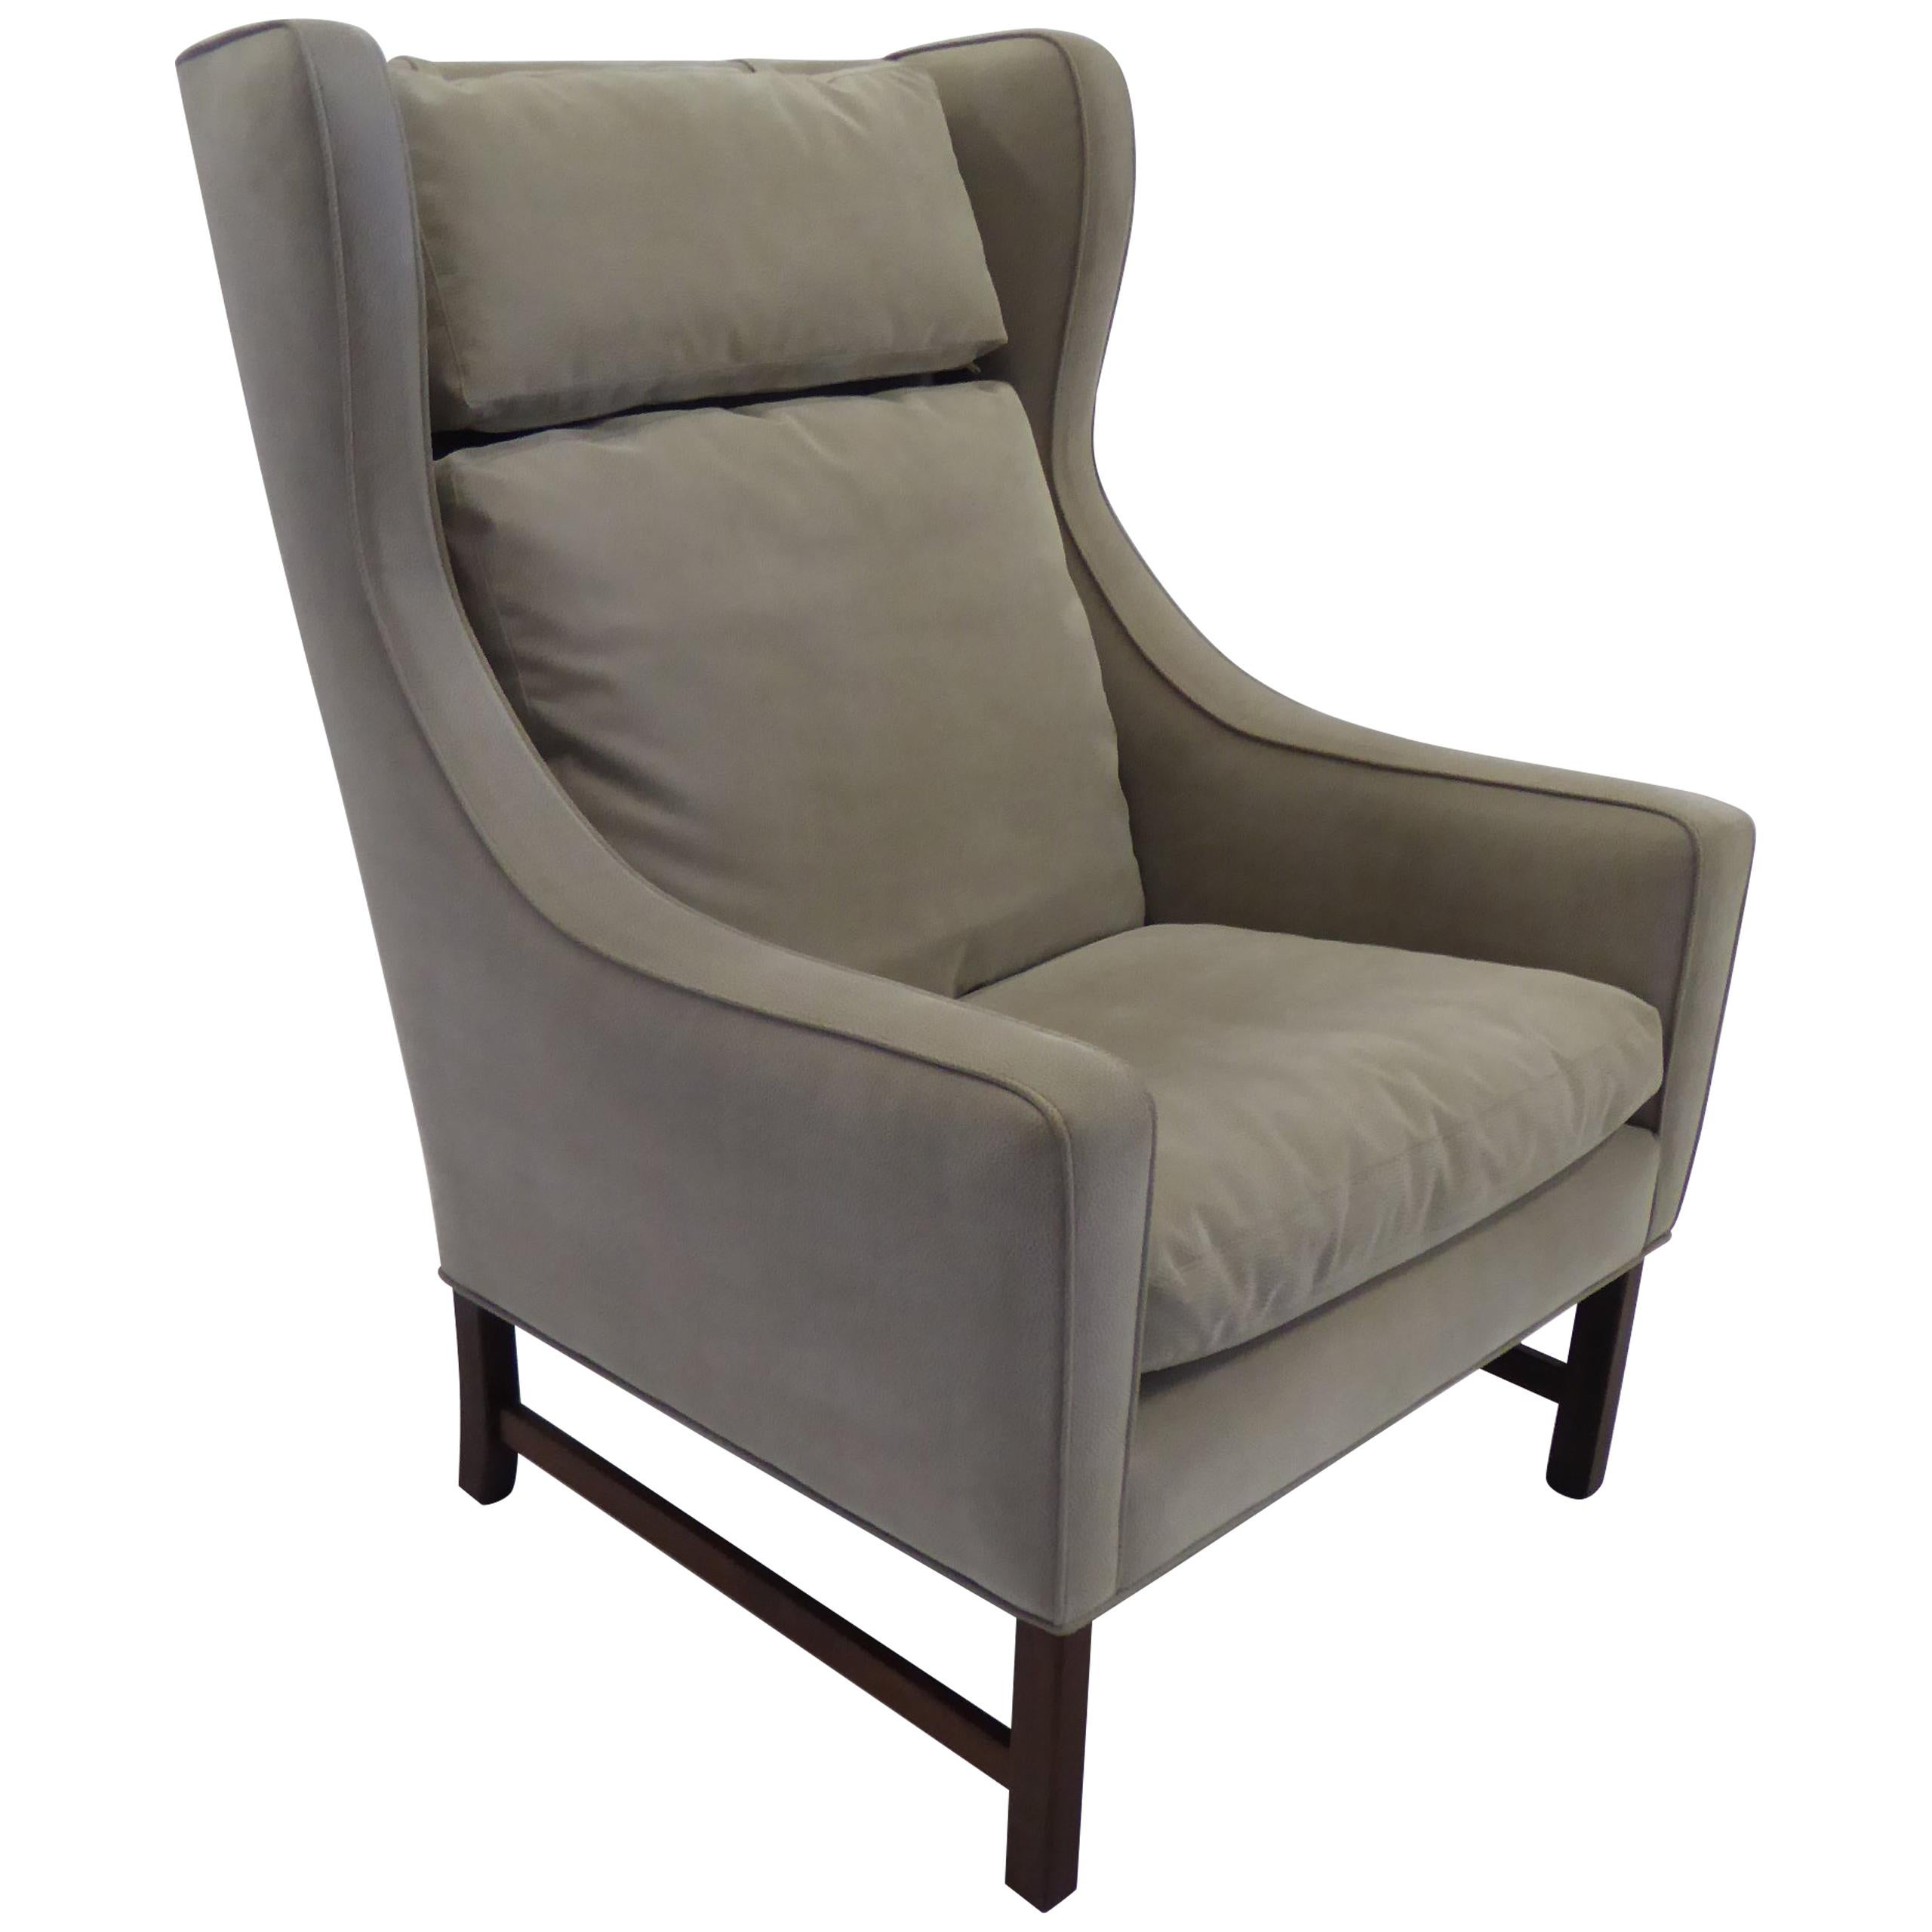 Fine 1960s Fredrik Kayser Wingback Chair for Vatne Møbler